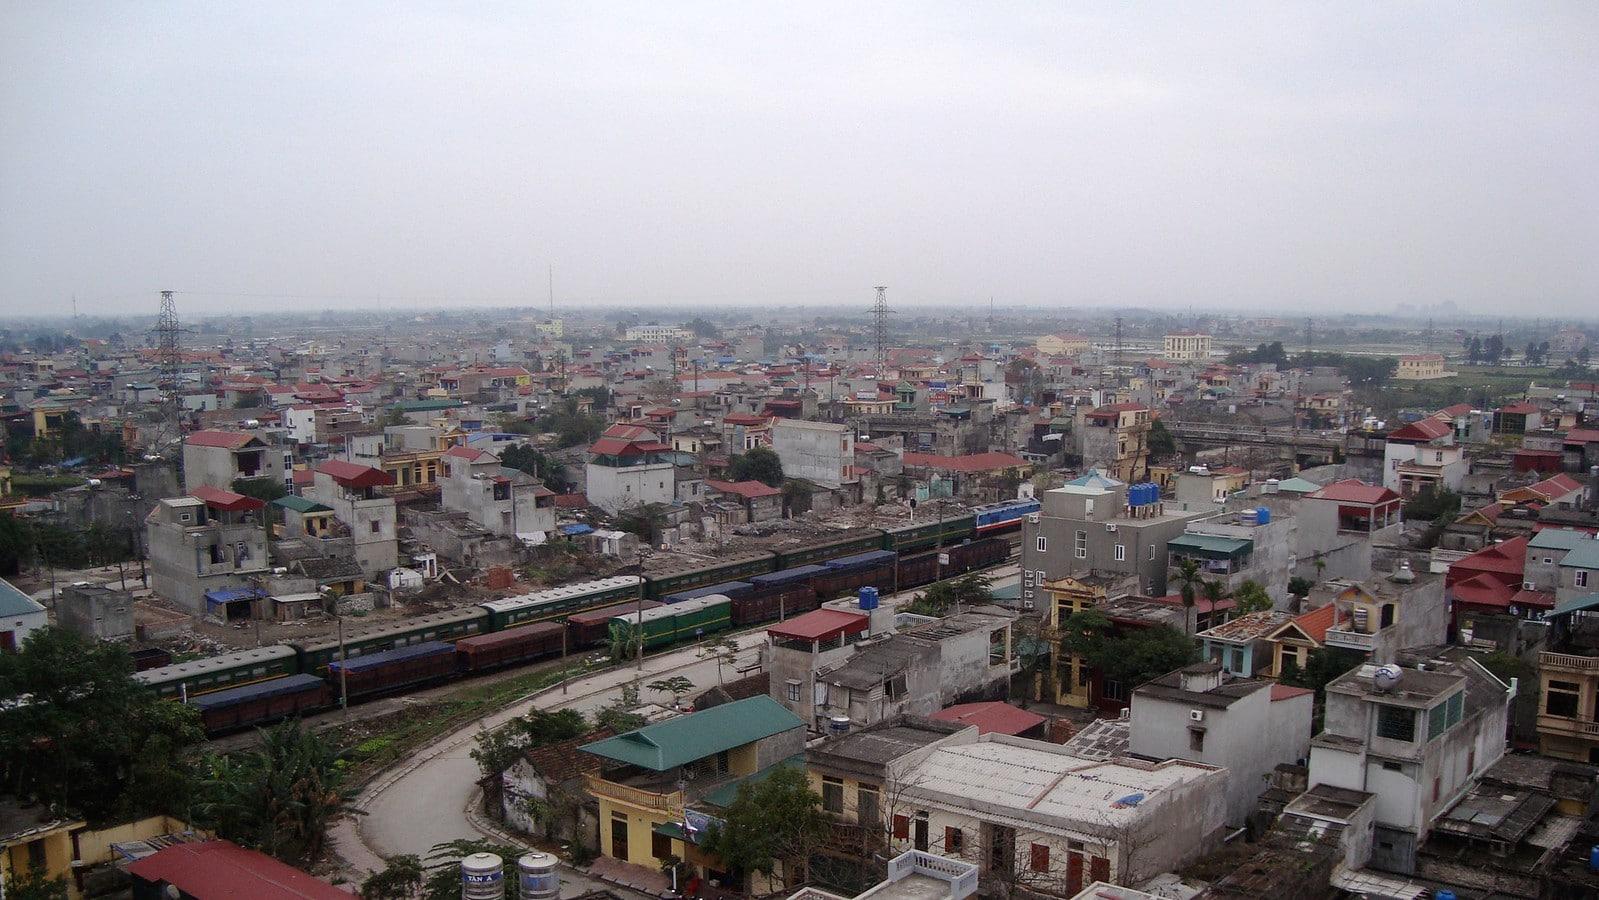 Cityscape of Ninh Bình, Vietnam